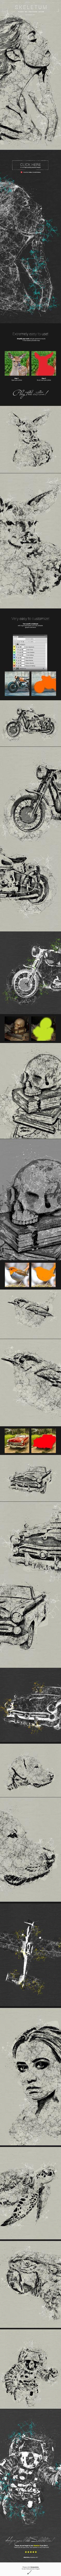 Skeletum - Plexus Art Photoshop Action - Photo Effects Actions